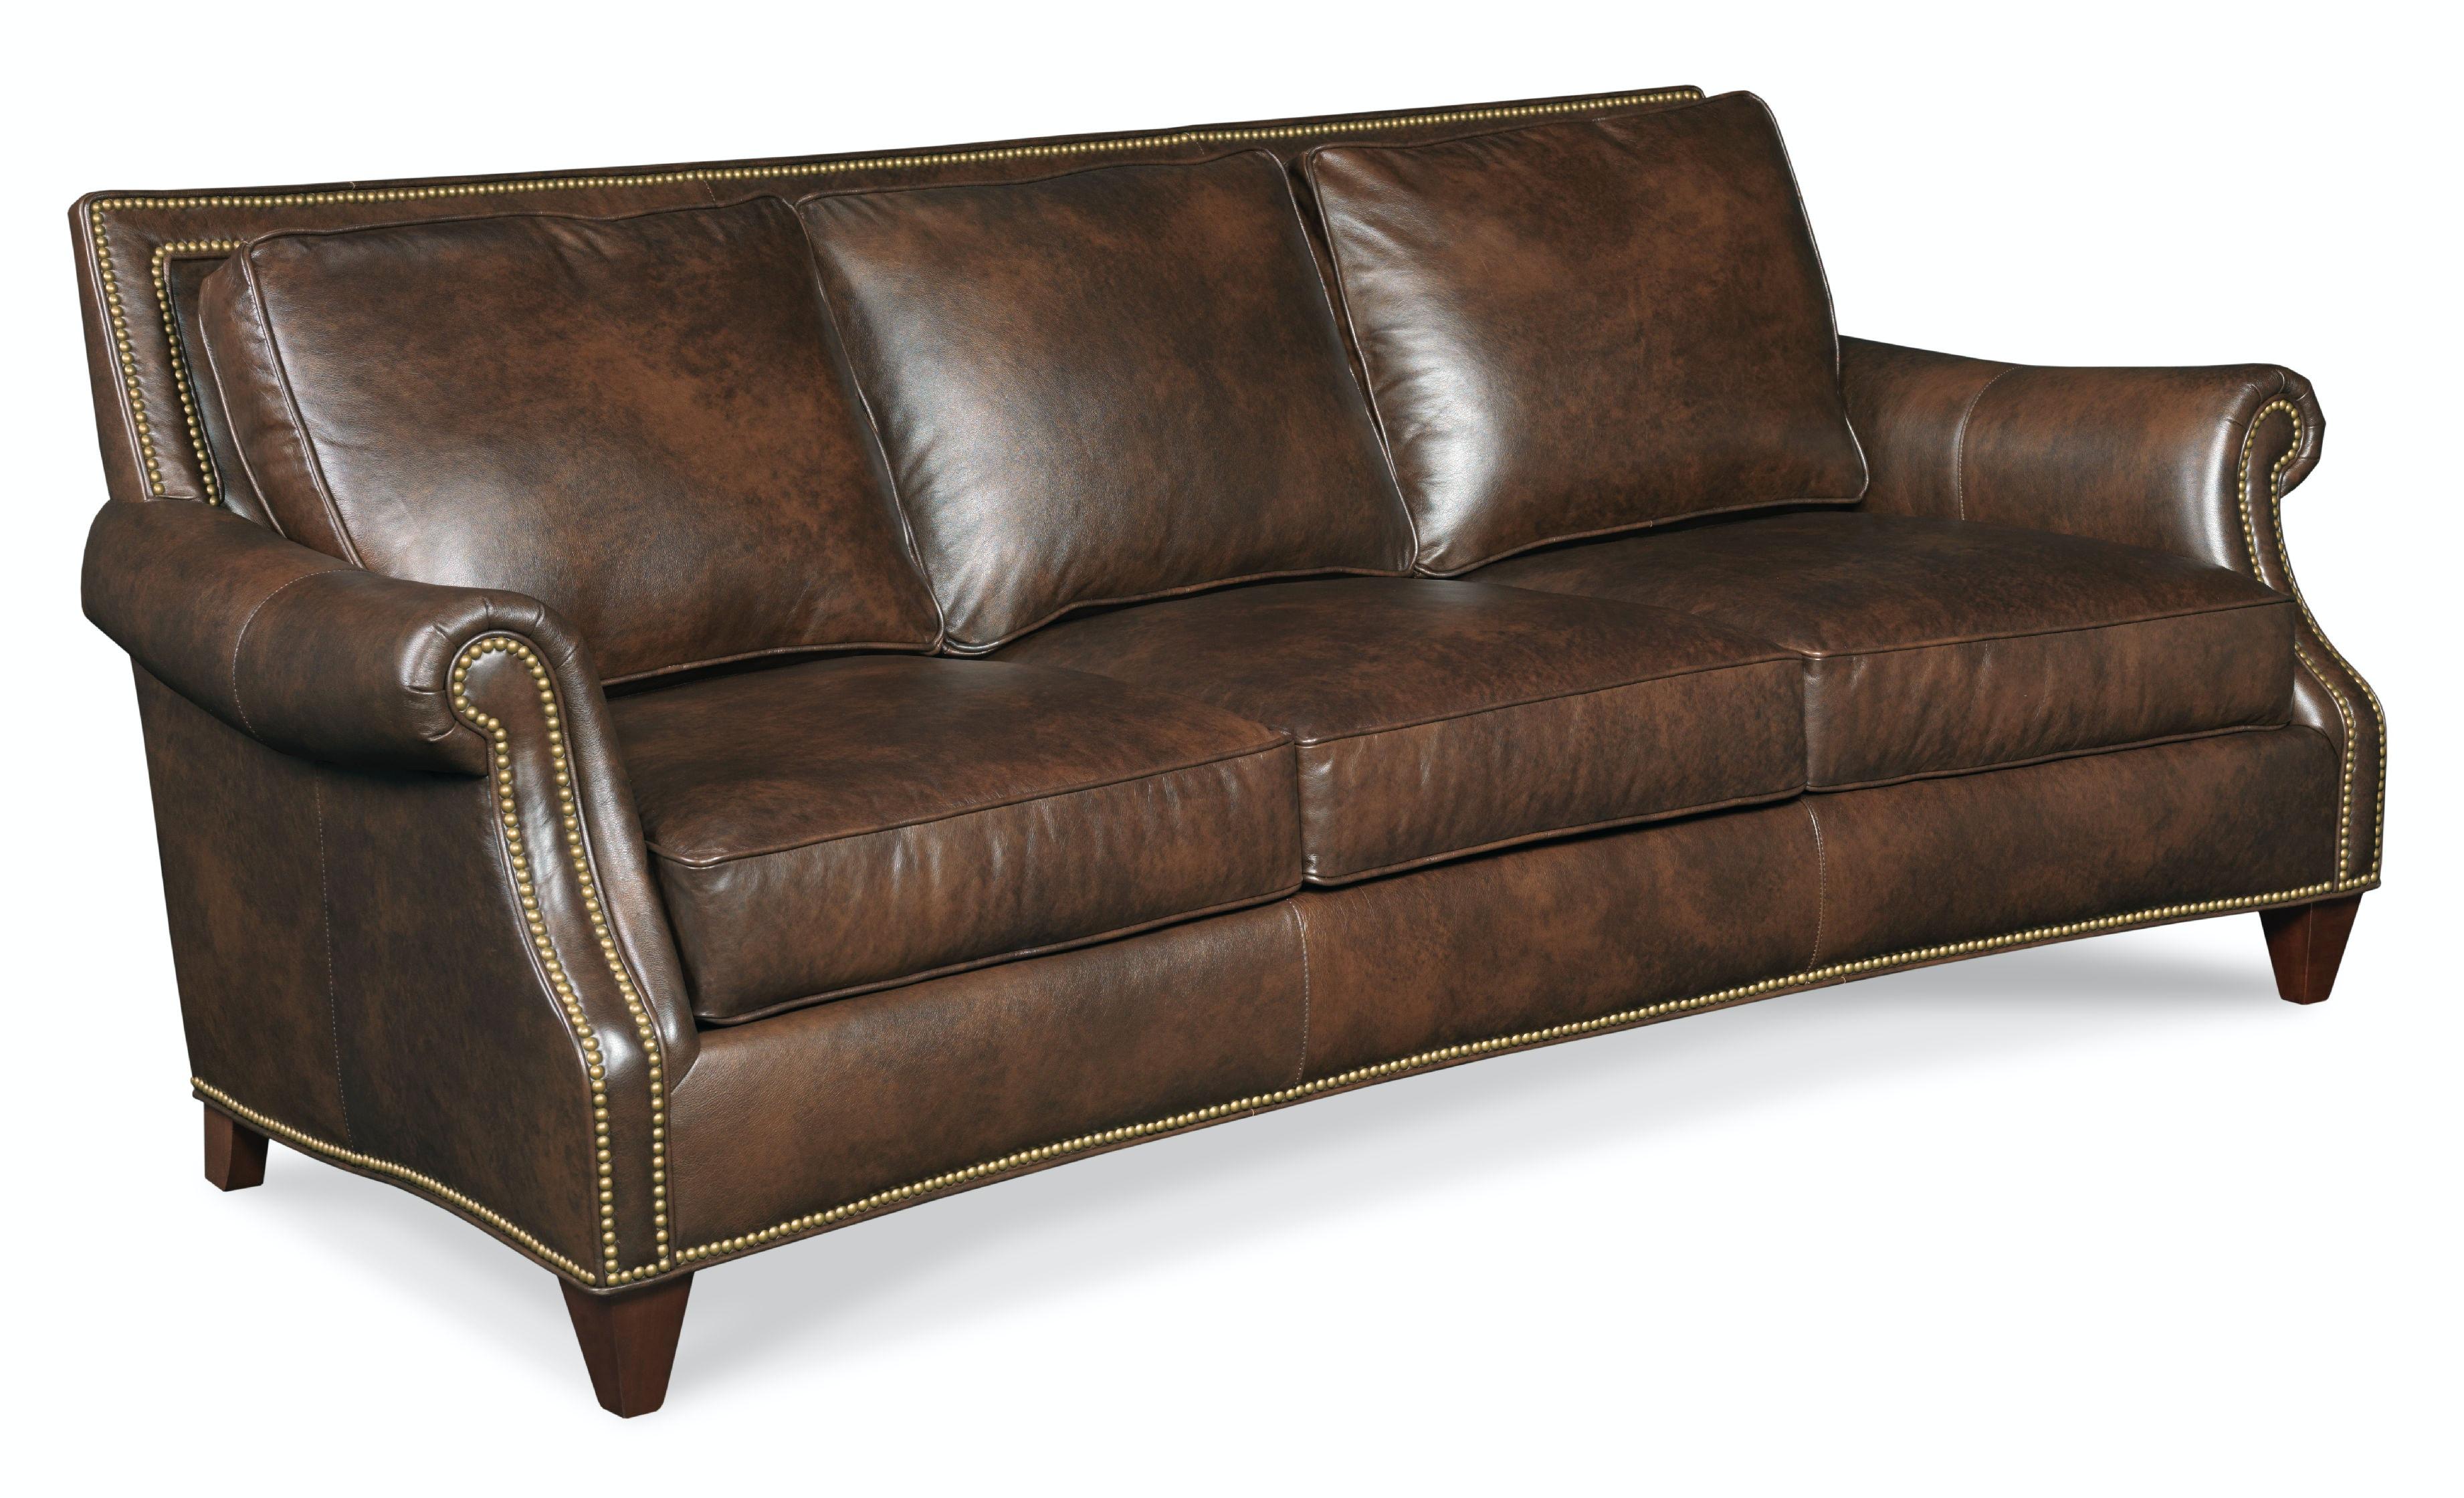 bradington young reclining sofa reviews 15 15 hus noorderpad de u2022 rh 15 15 hus noorderpad de